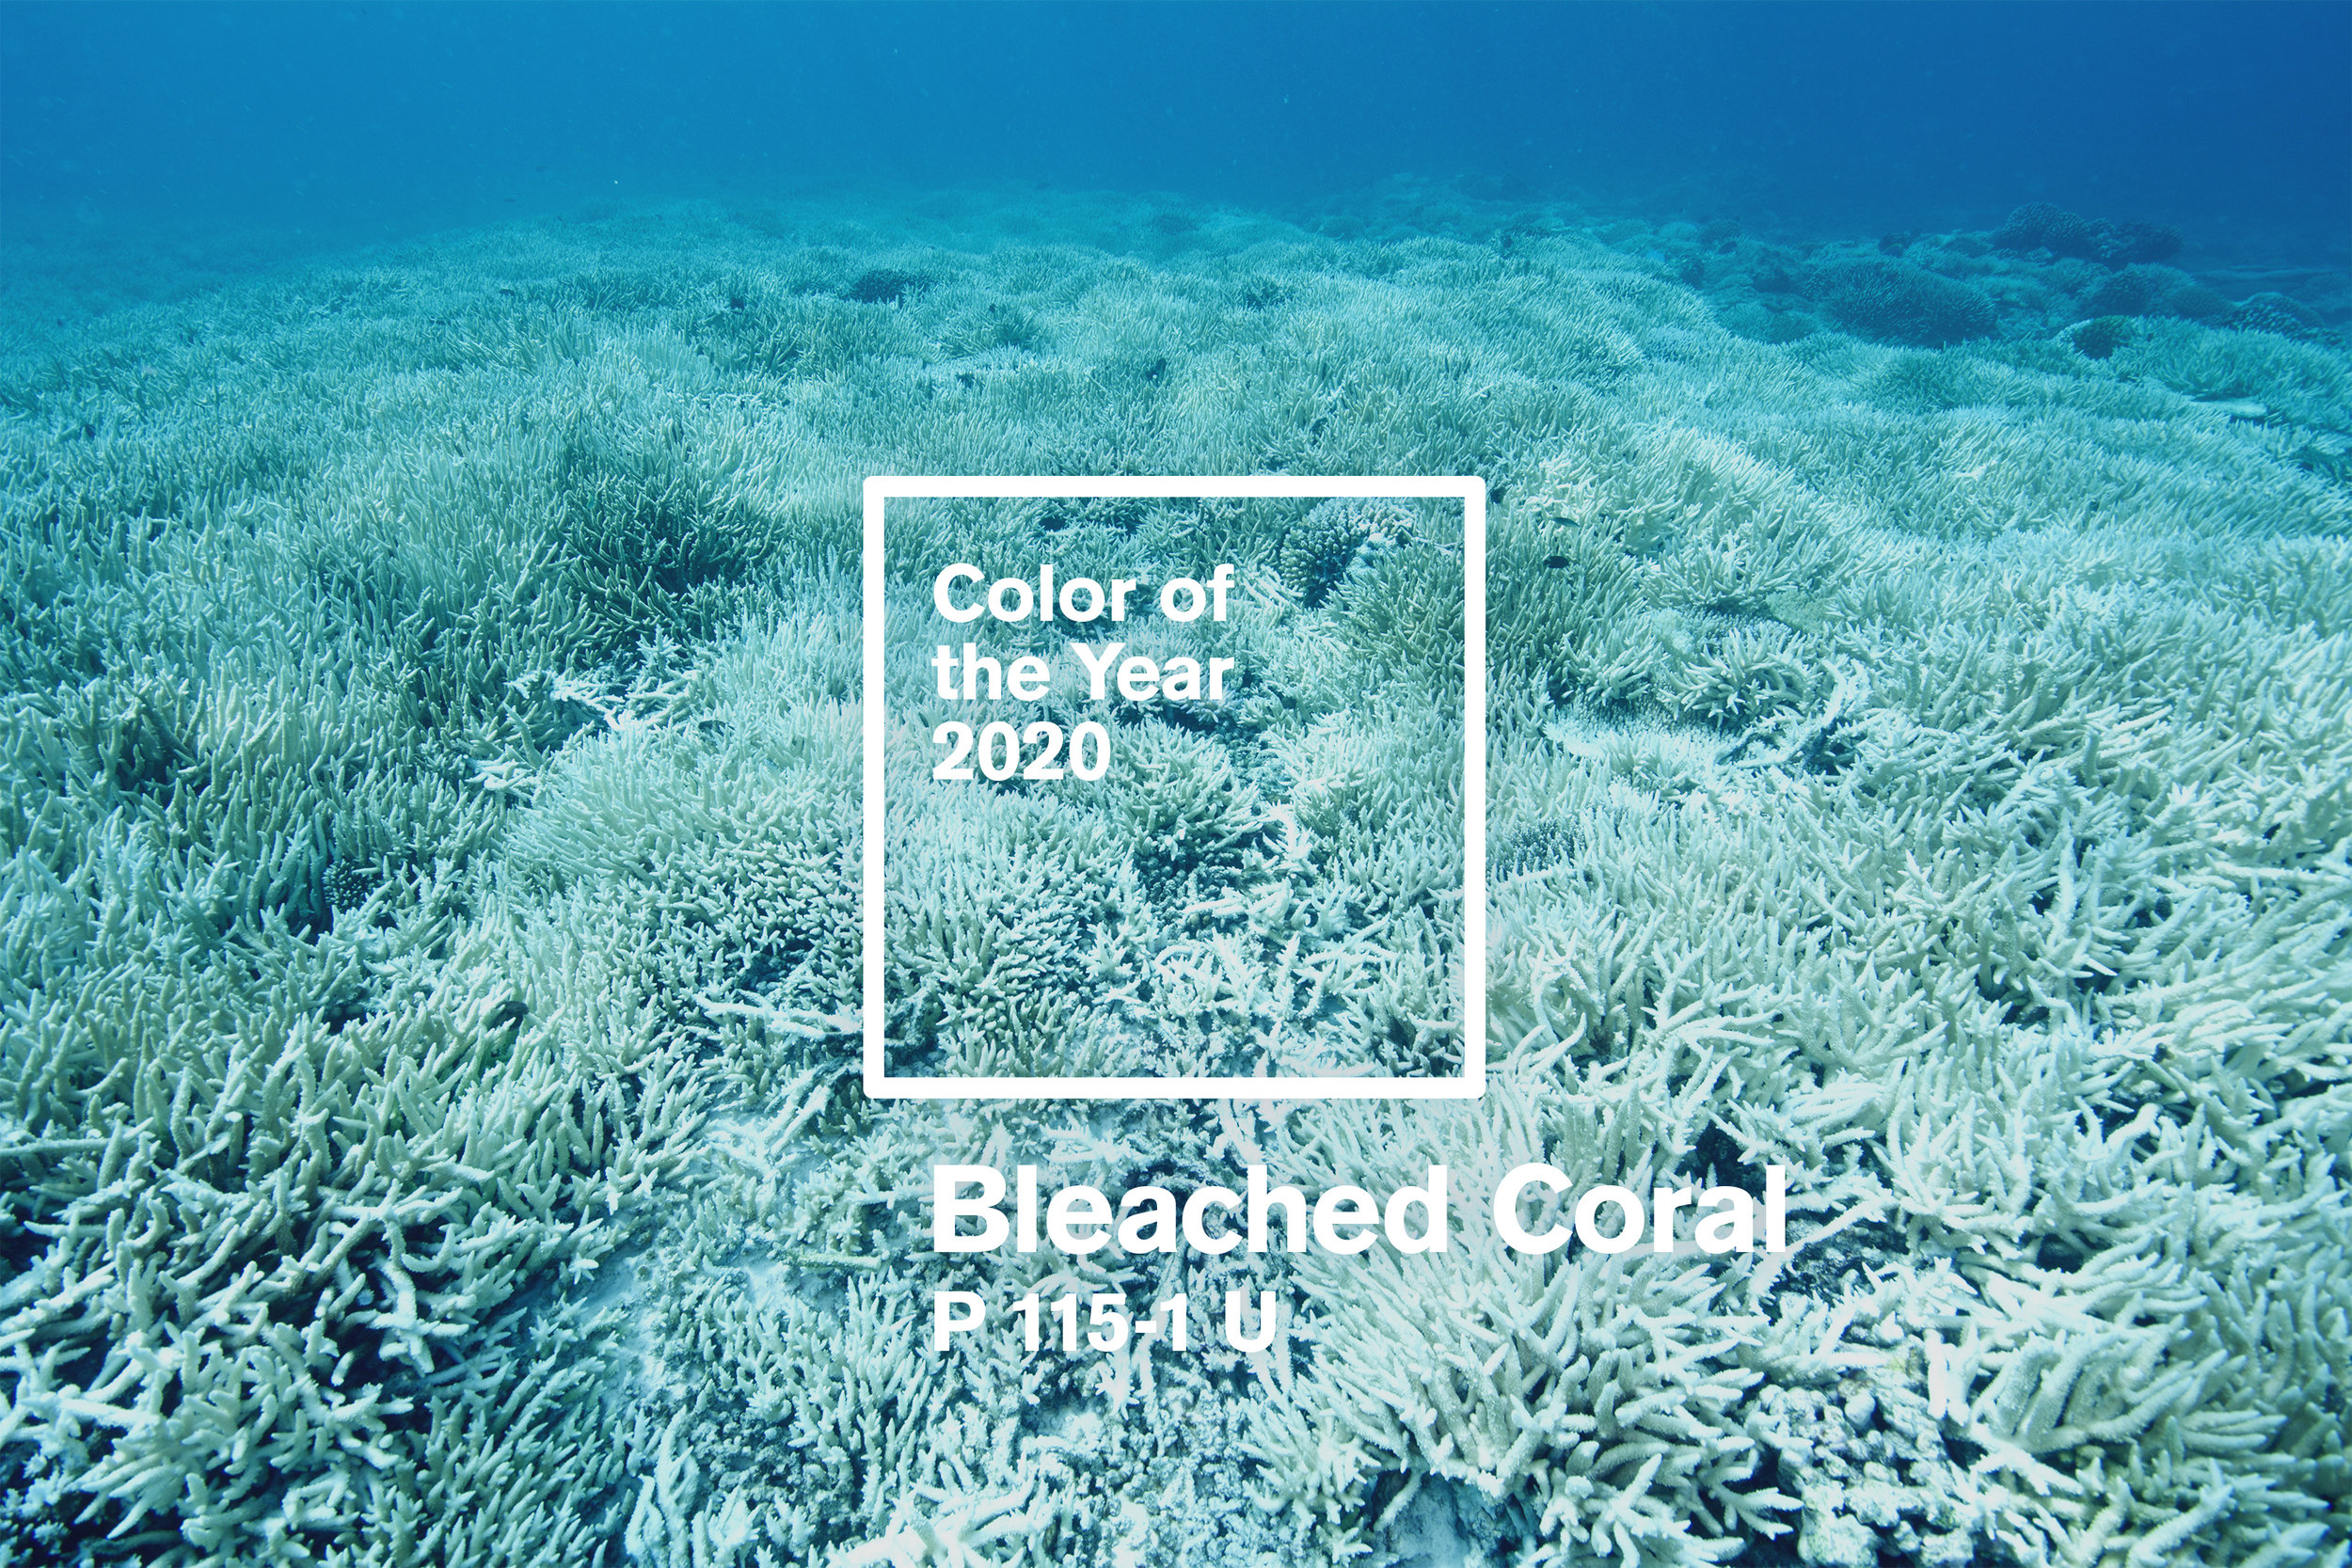 ColorOfTheYear2020-Image.jpg